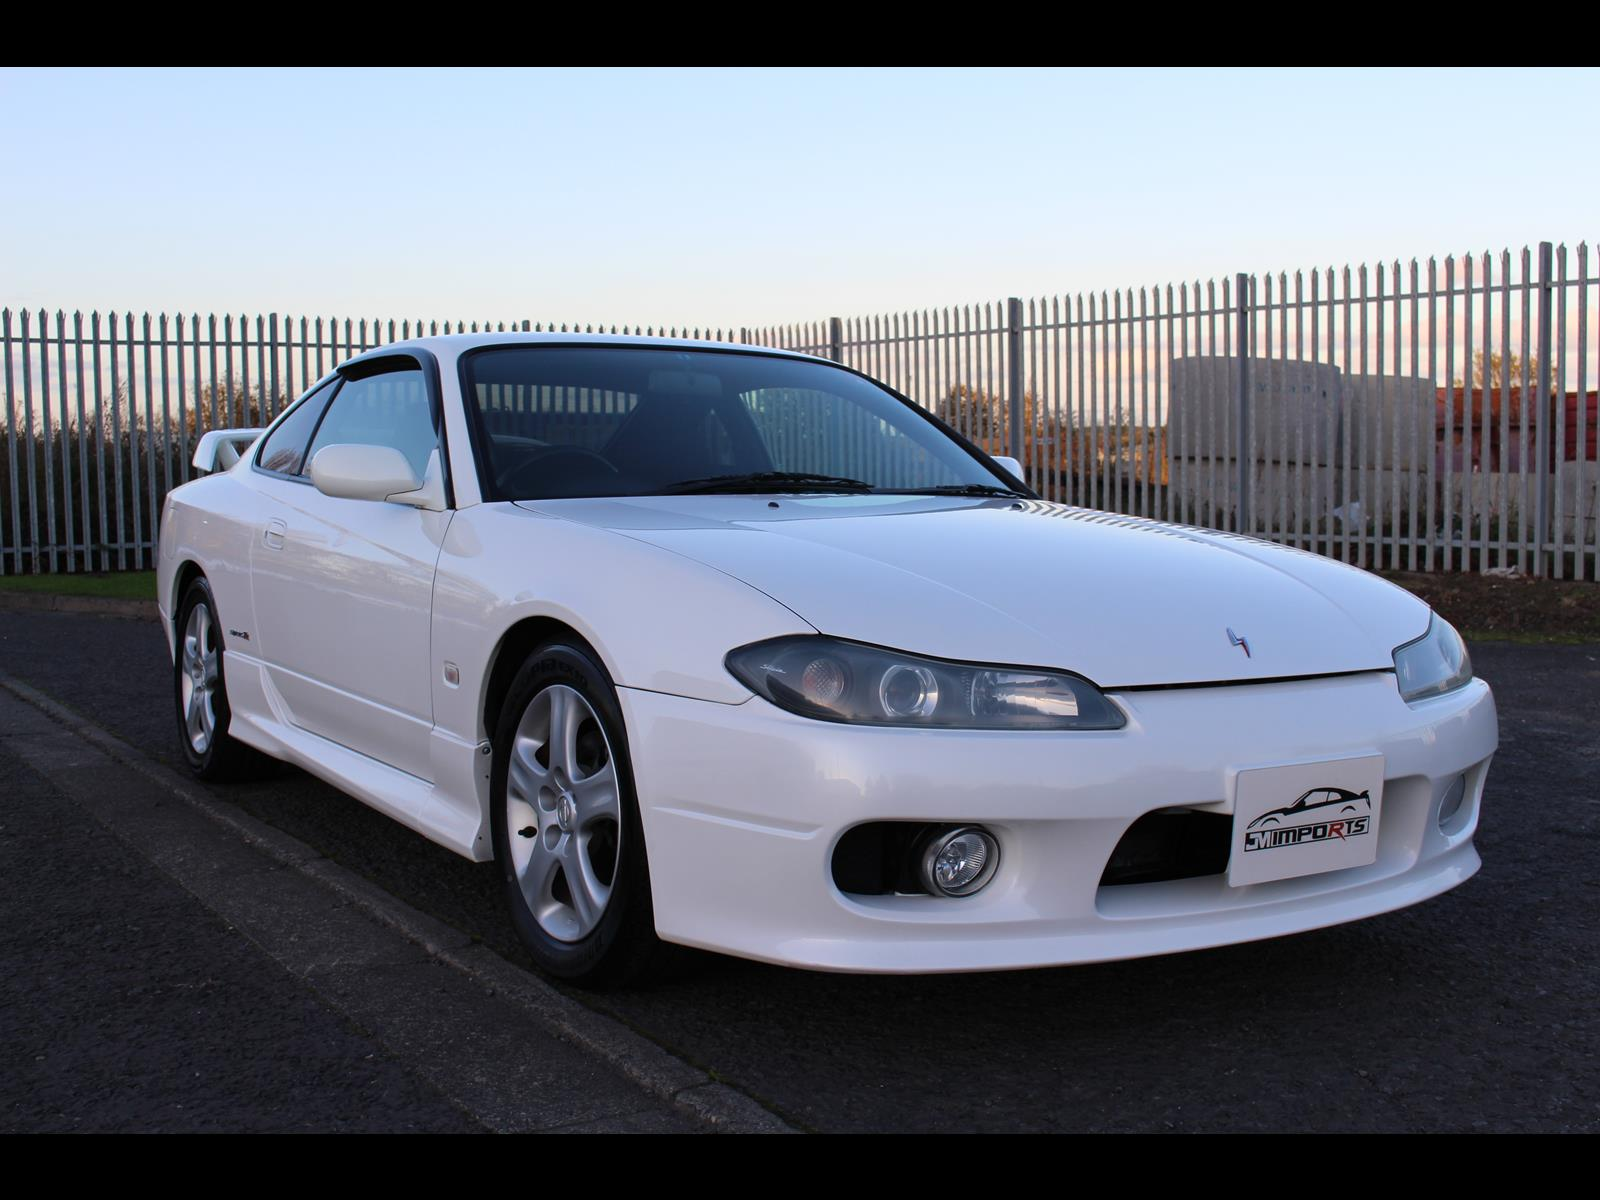 2002 Nissan Silvia S15 Spec R 6 Speed Manual Http Www